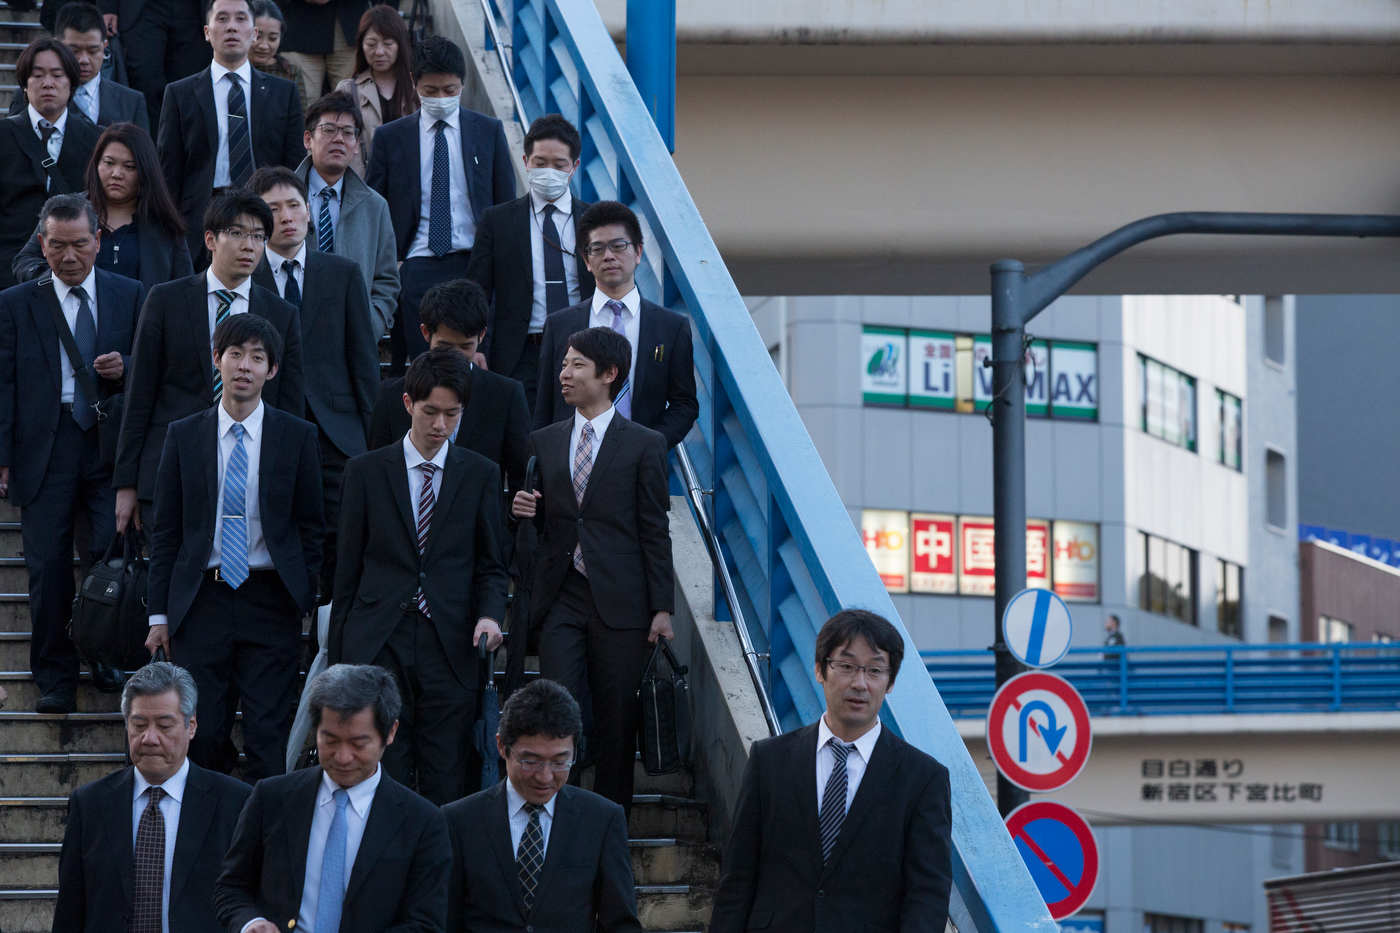 Salarymen, Lidabashi station.